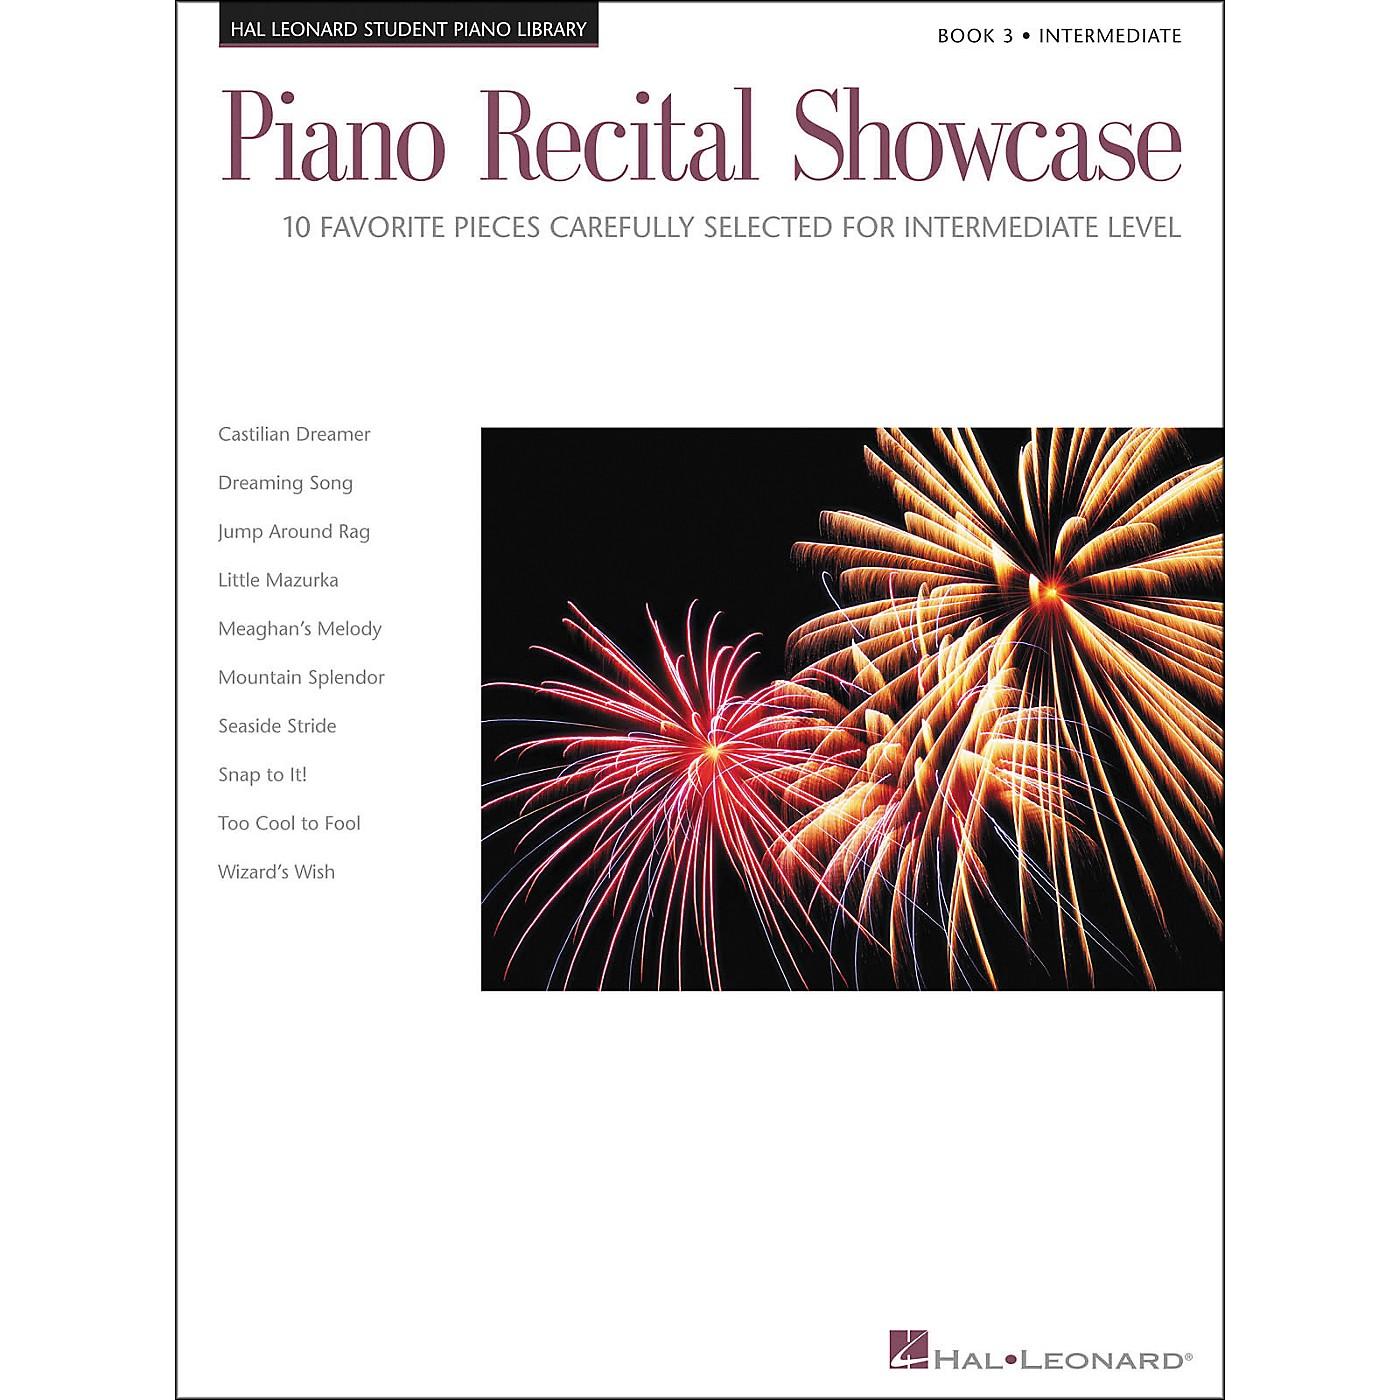 Hal Leonard Piano Recital Showcase Book 3 Intermediate level Hal Leonard Student Piano Library thumbnail